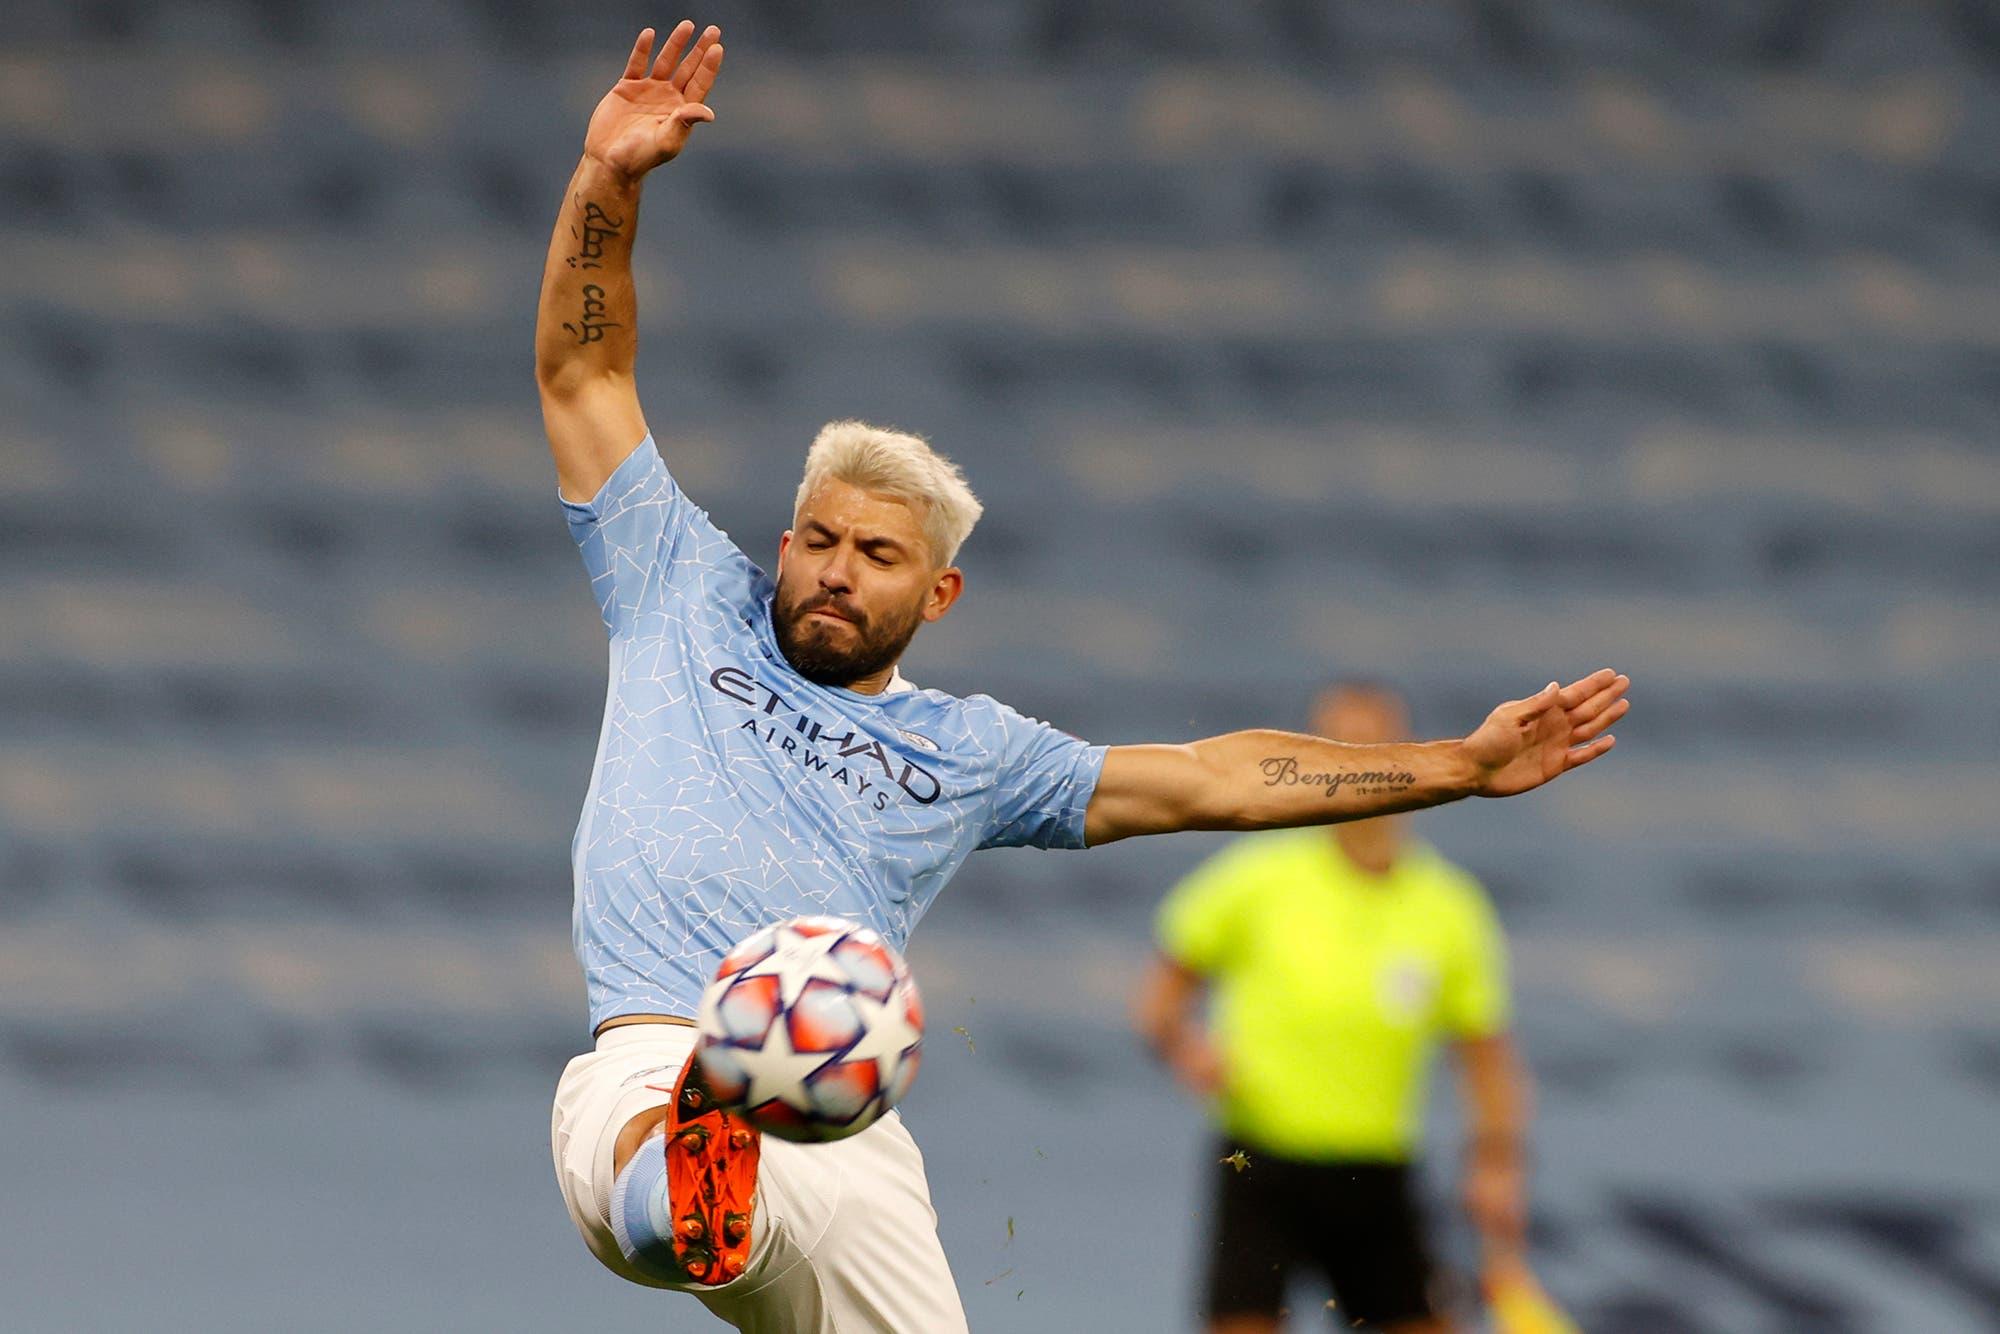 Champions League: Agüero volvió al gol después de 231 días y Manchester City venció 3-1 a Porto